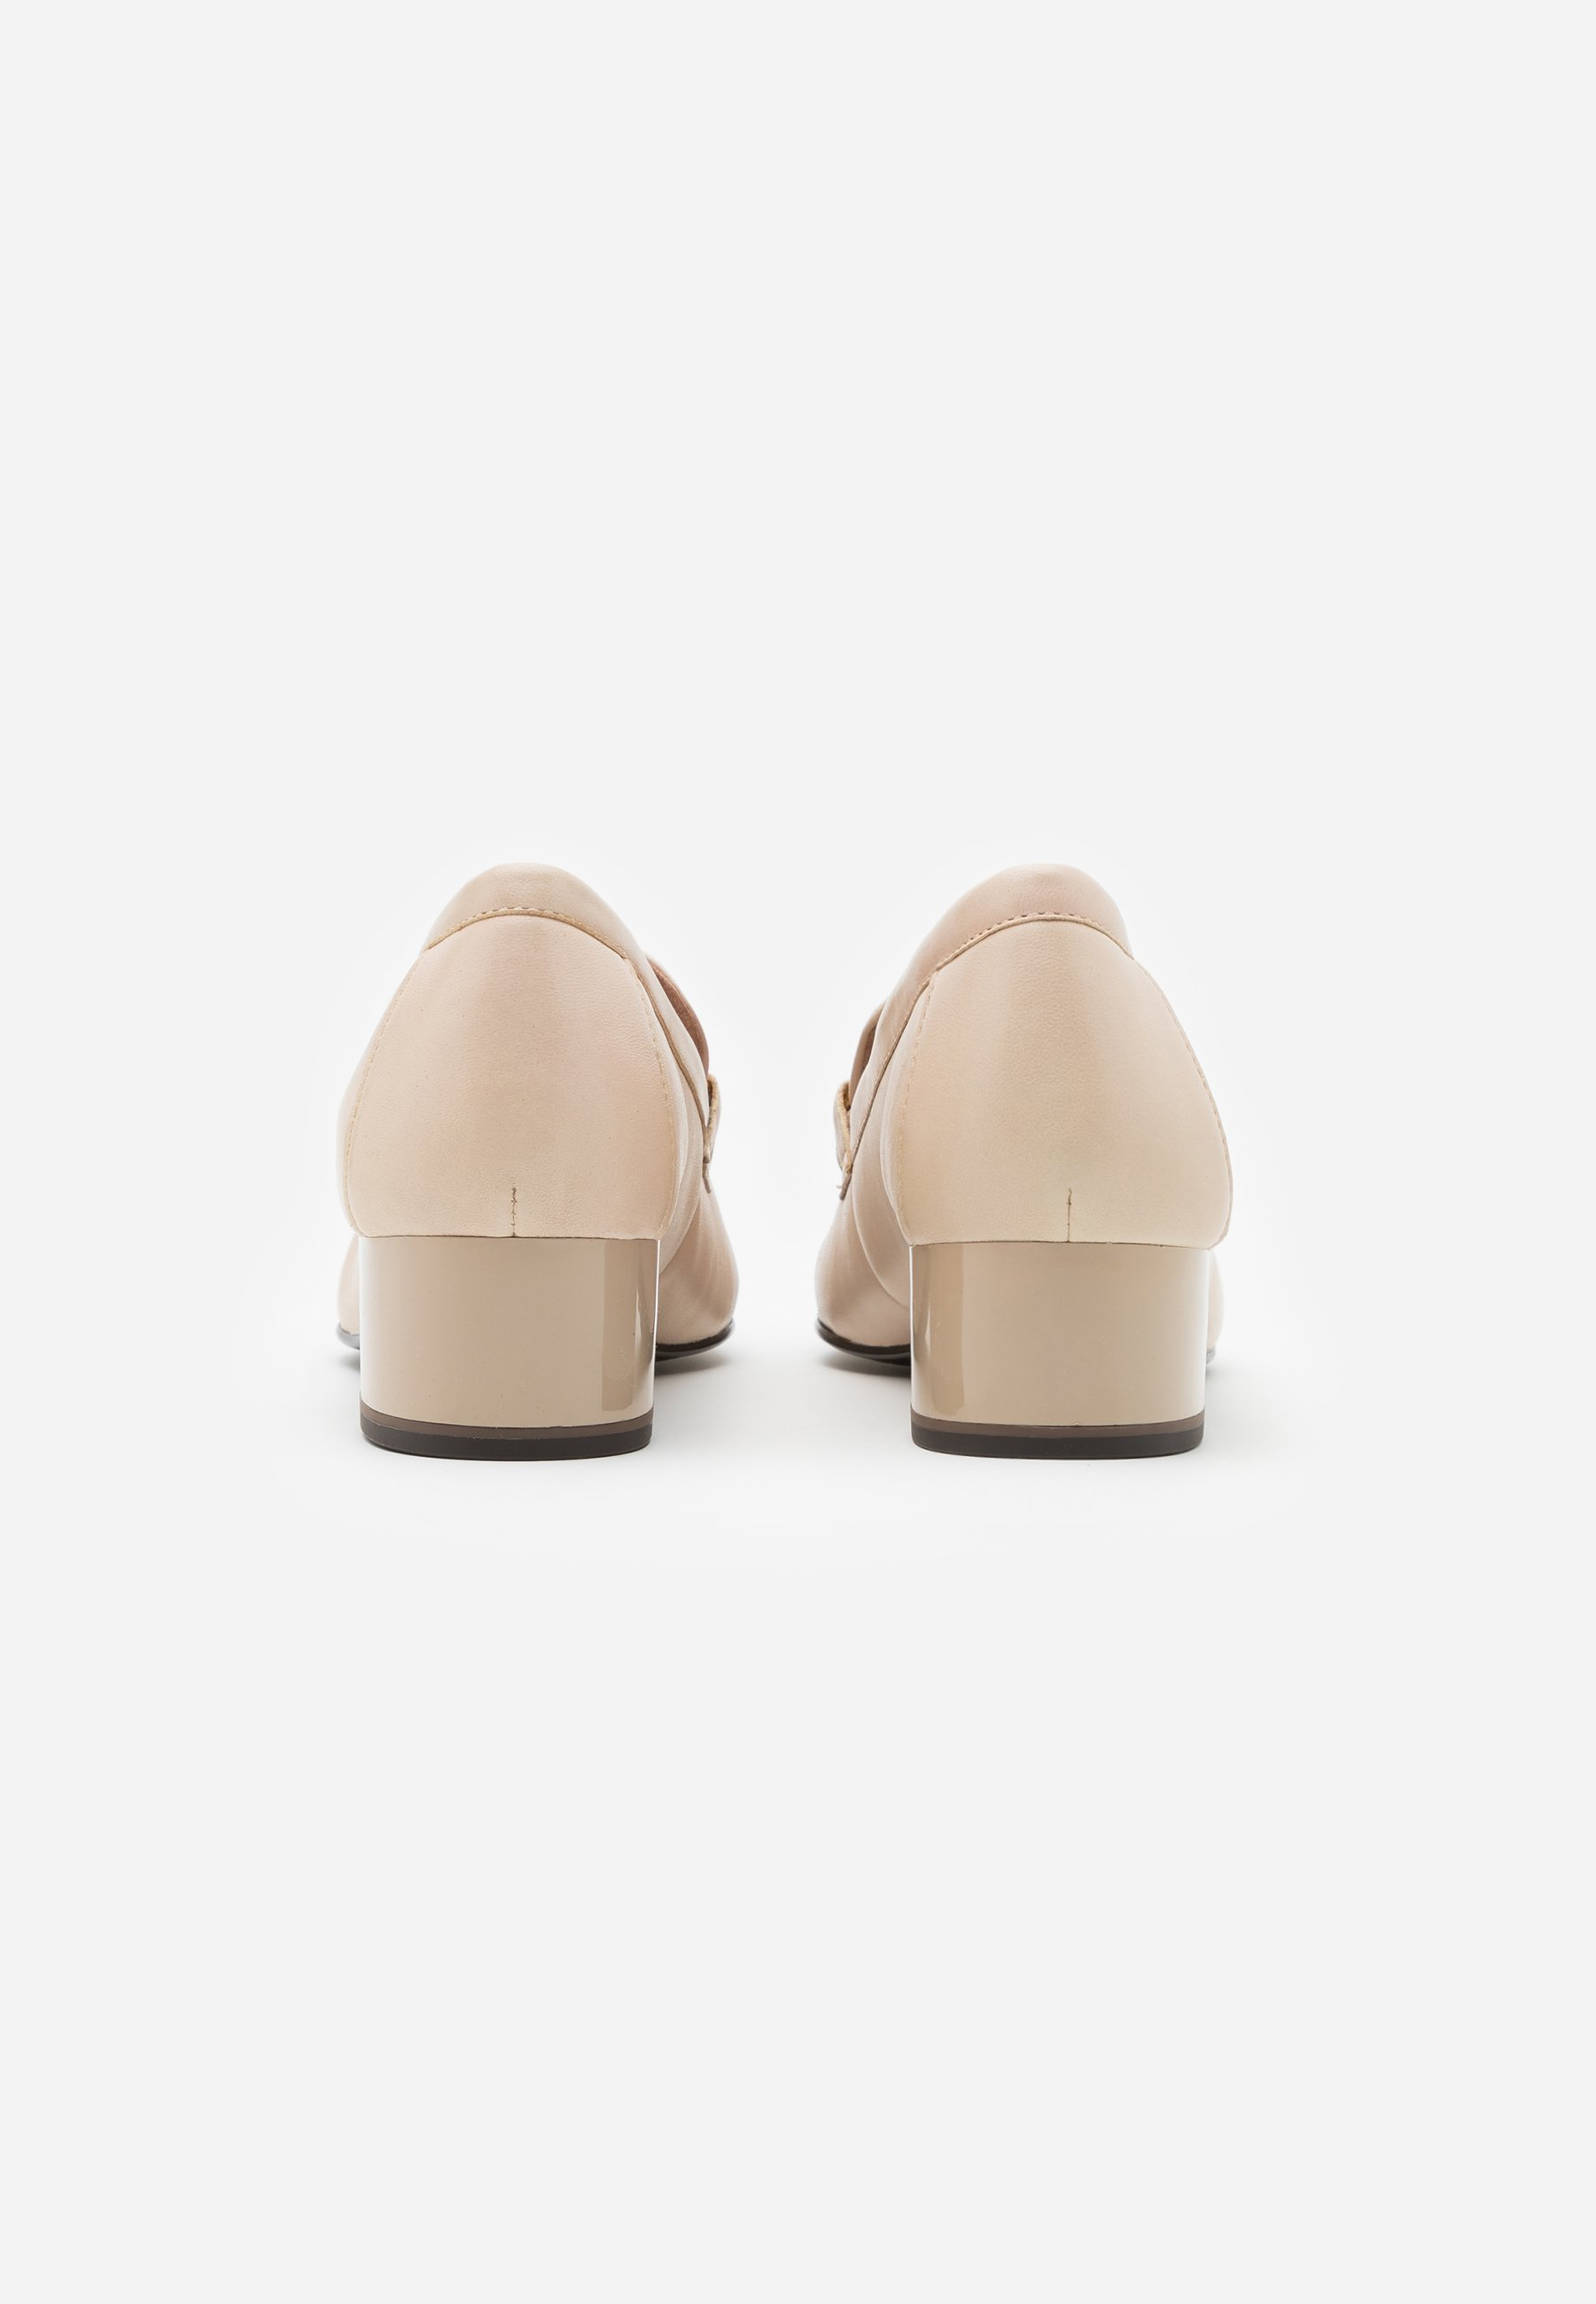 Tamaris Loafers - Ivory